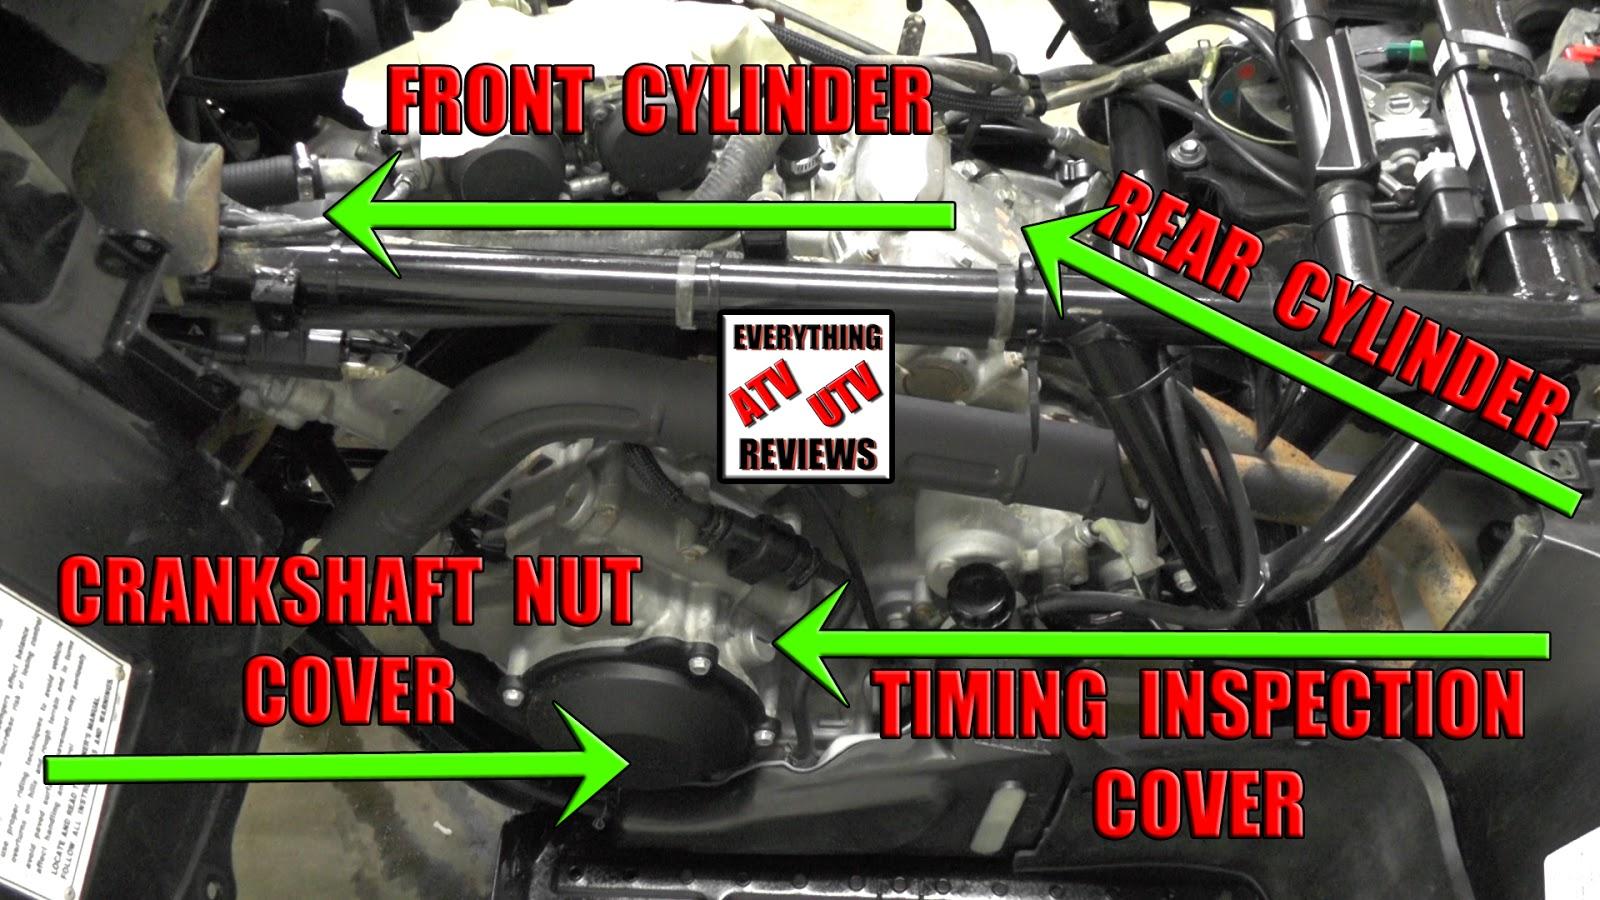 Tusk Wiring Harness Diagram Everything Atv Utv Reviews How To Adjust Valves On